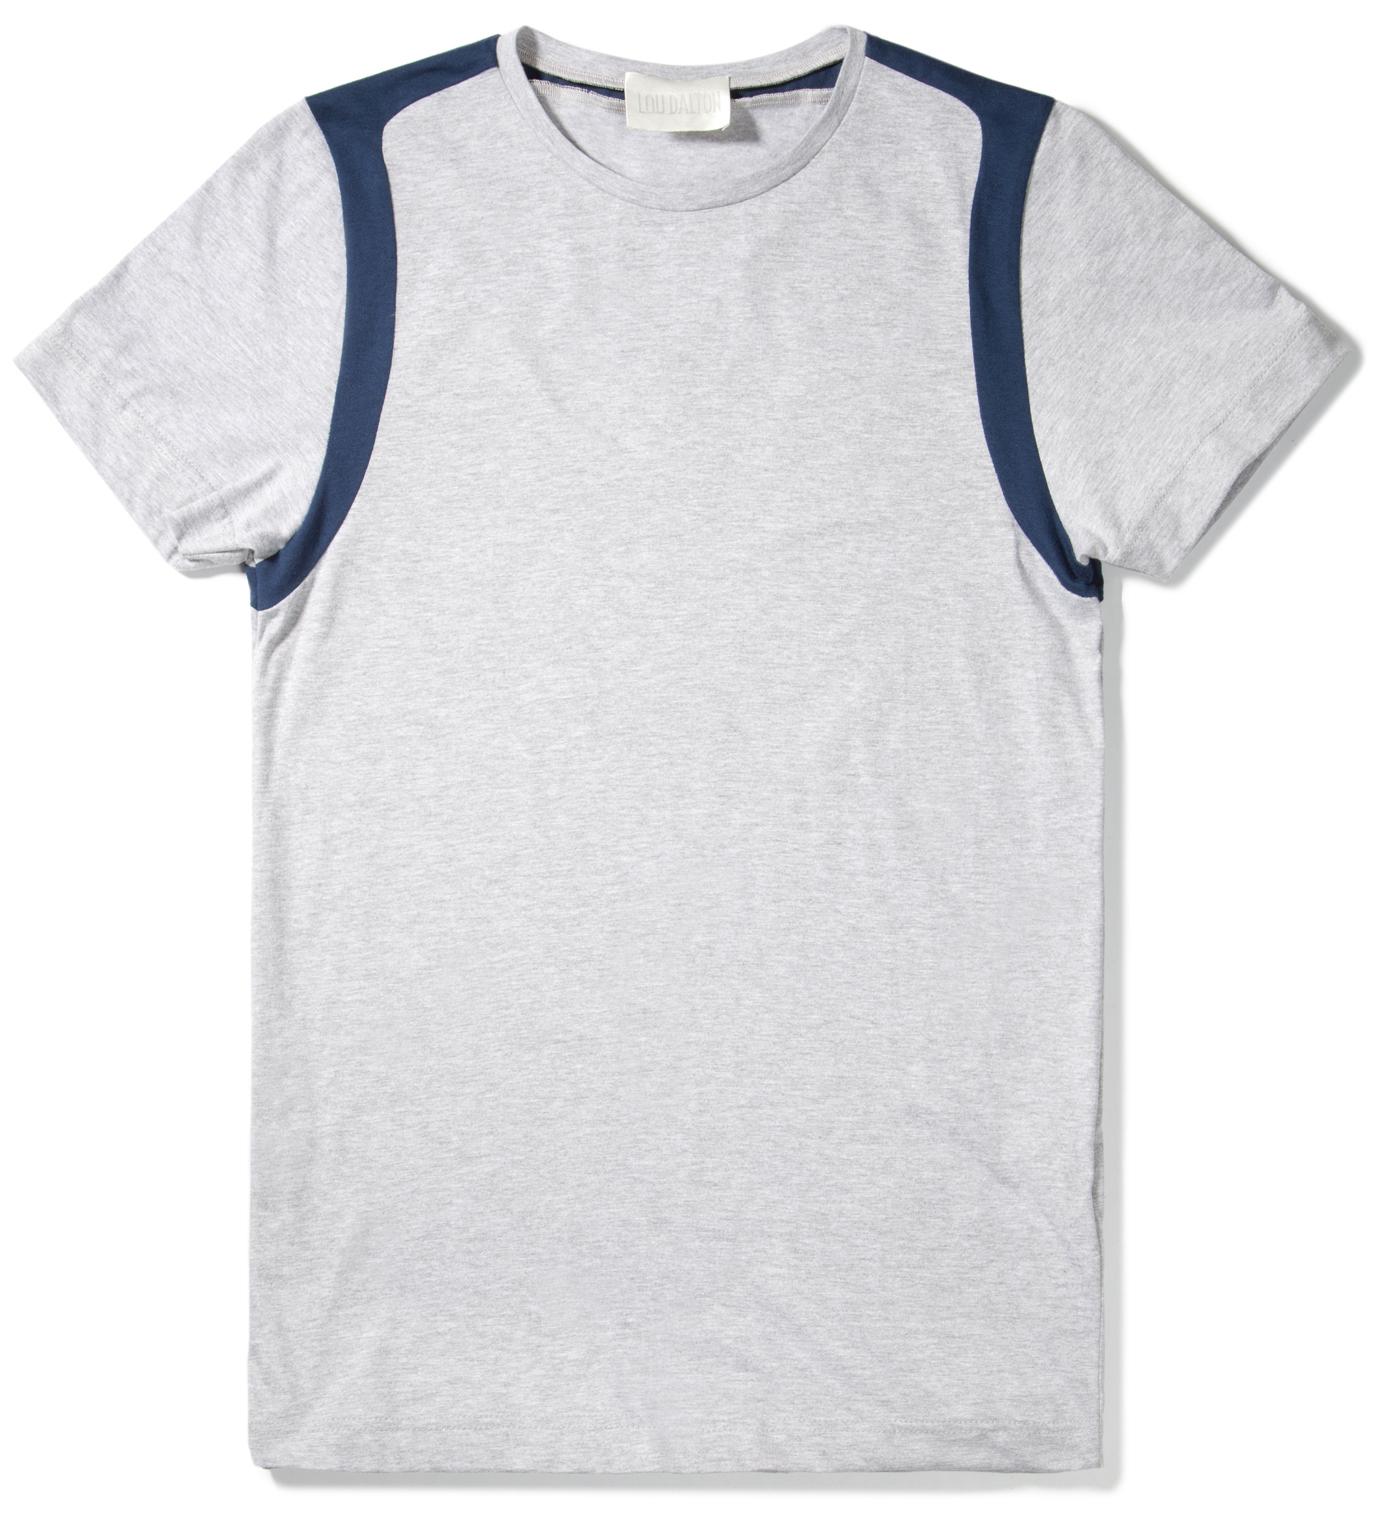 Lou Dalton Navy/Grey Marble Strap Shoulder T-Shirt